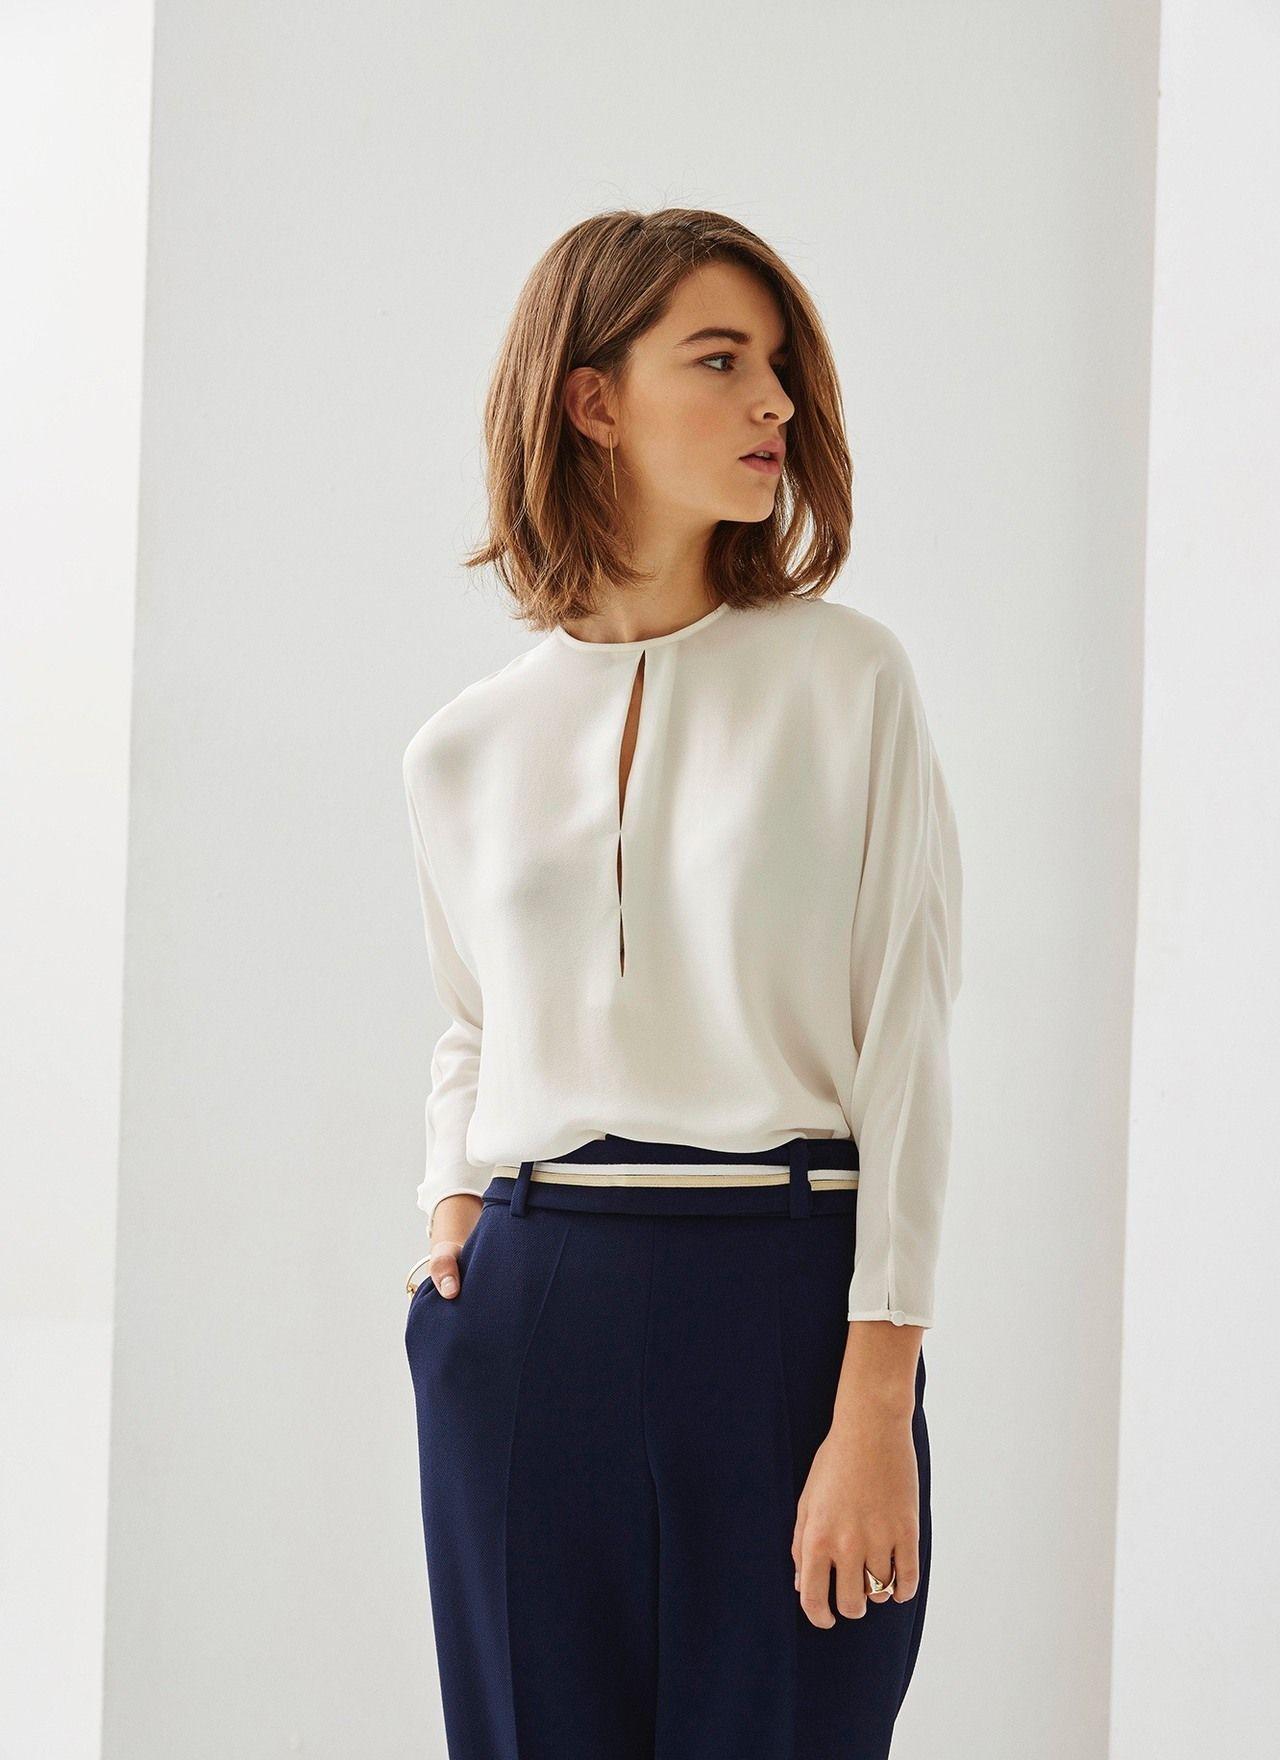 2d51d898e Camisa de seda con abertura - AD Mujer | Adolfo Dominguez shop online